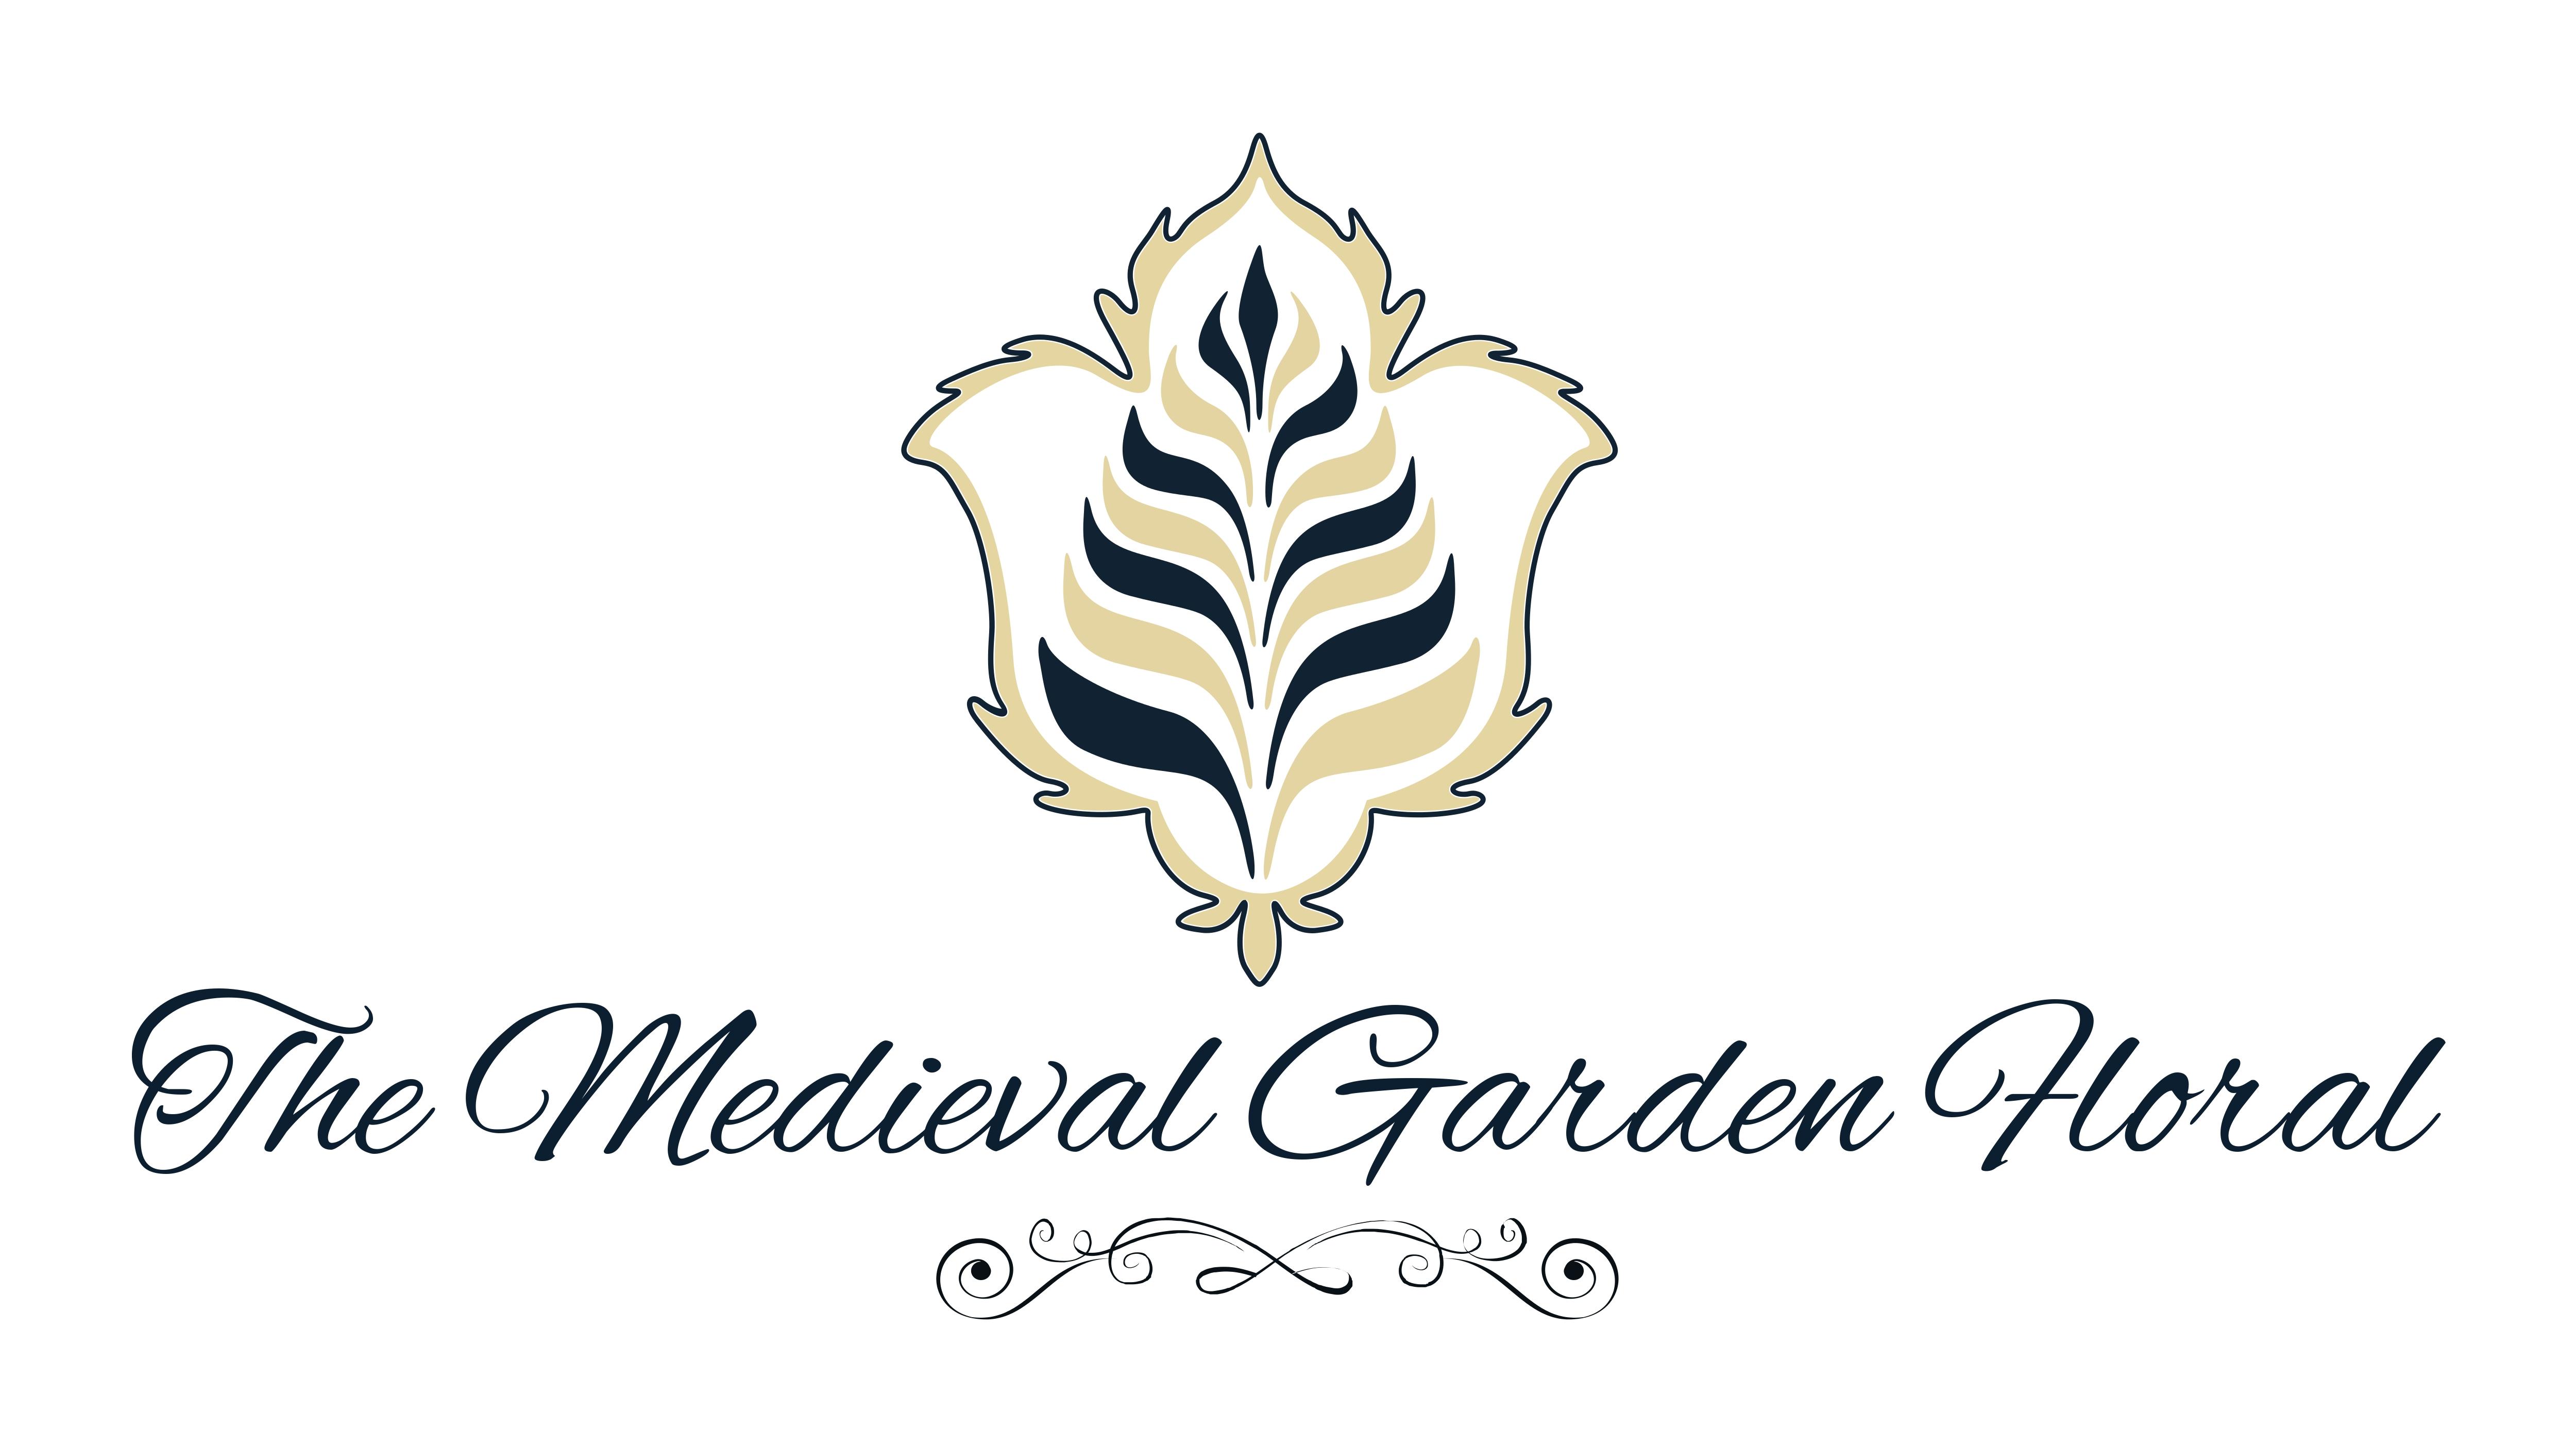 The Medieval Garden Floral